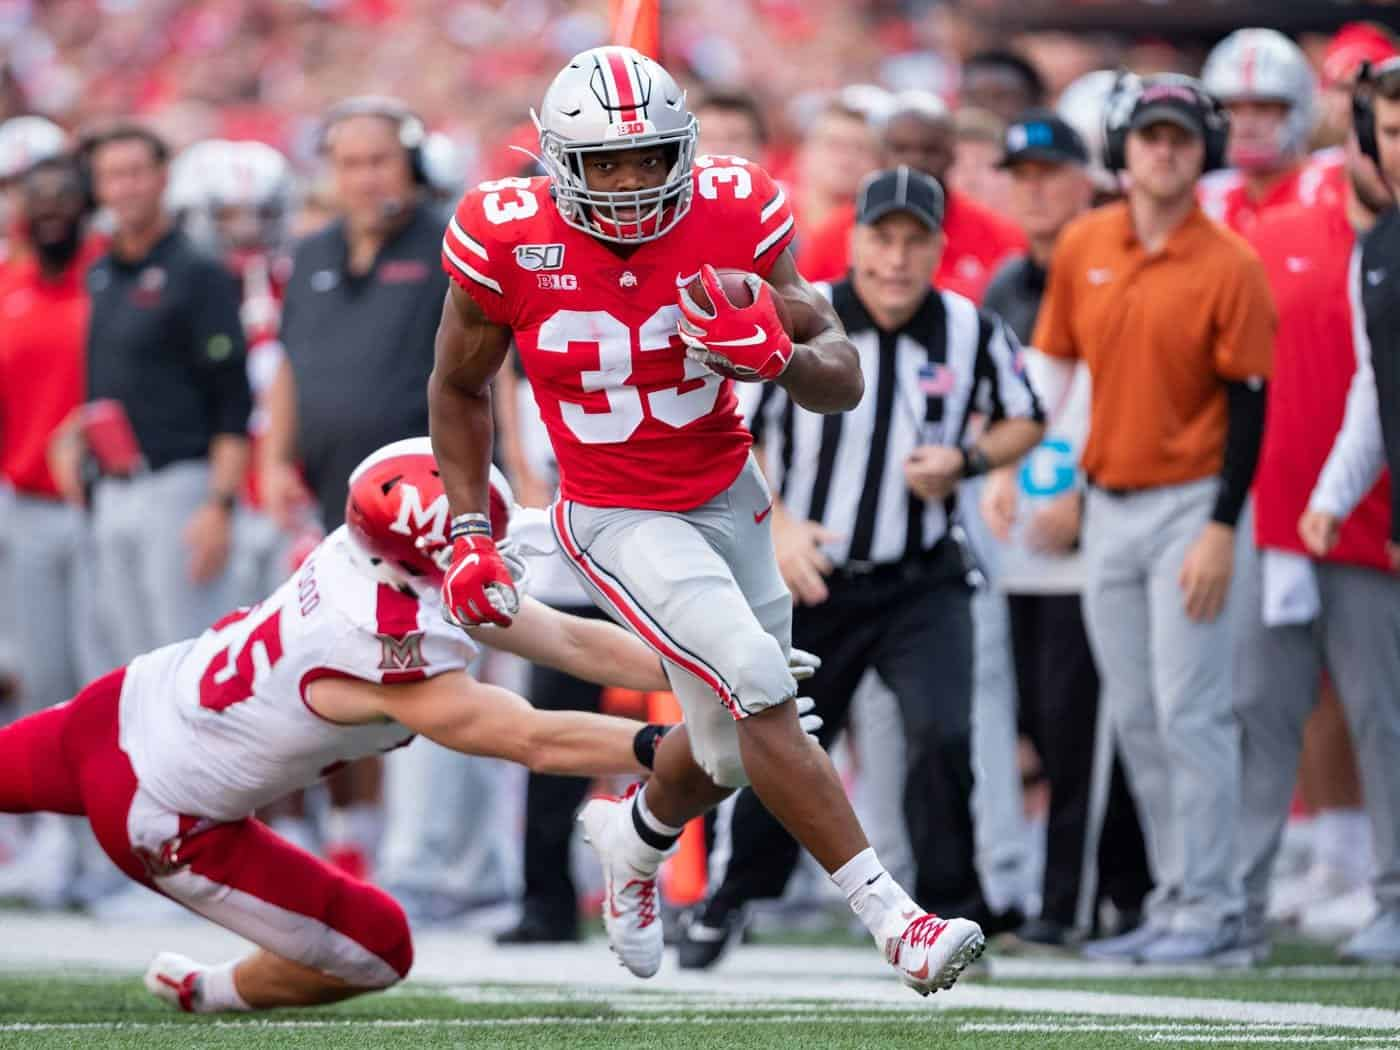 2021 NFL Draft: The 2020 Ohio State Buckeyes' running back battle